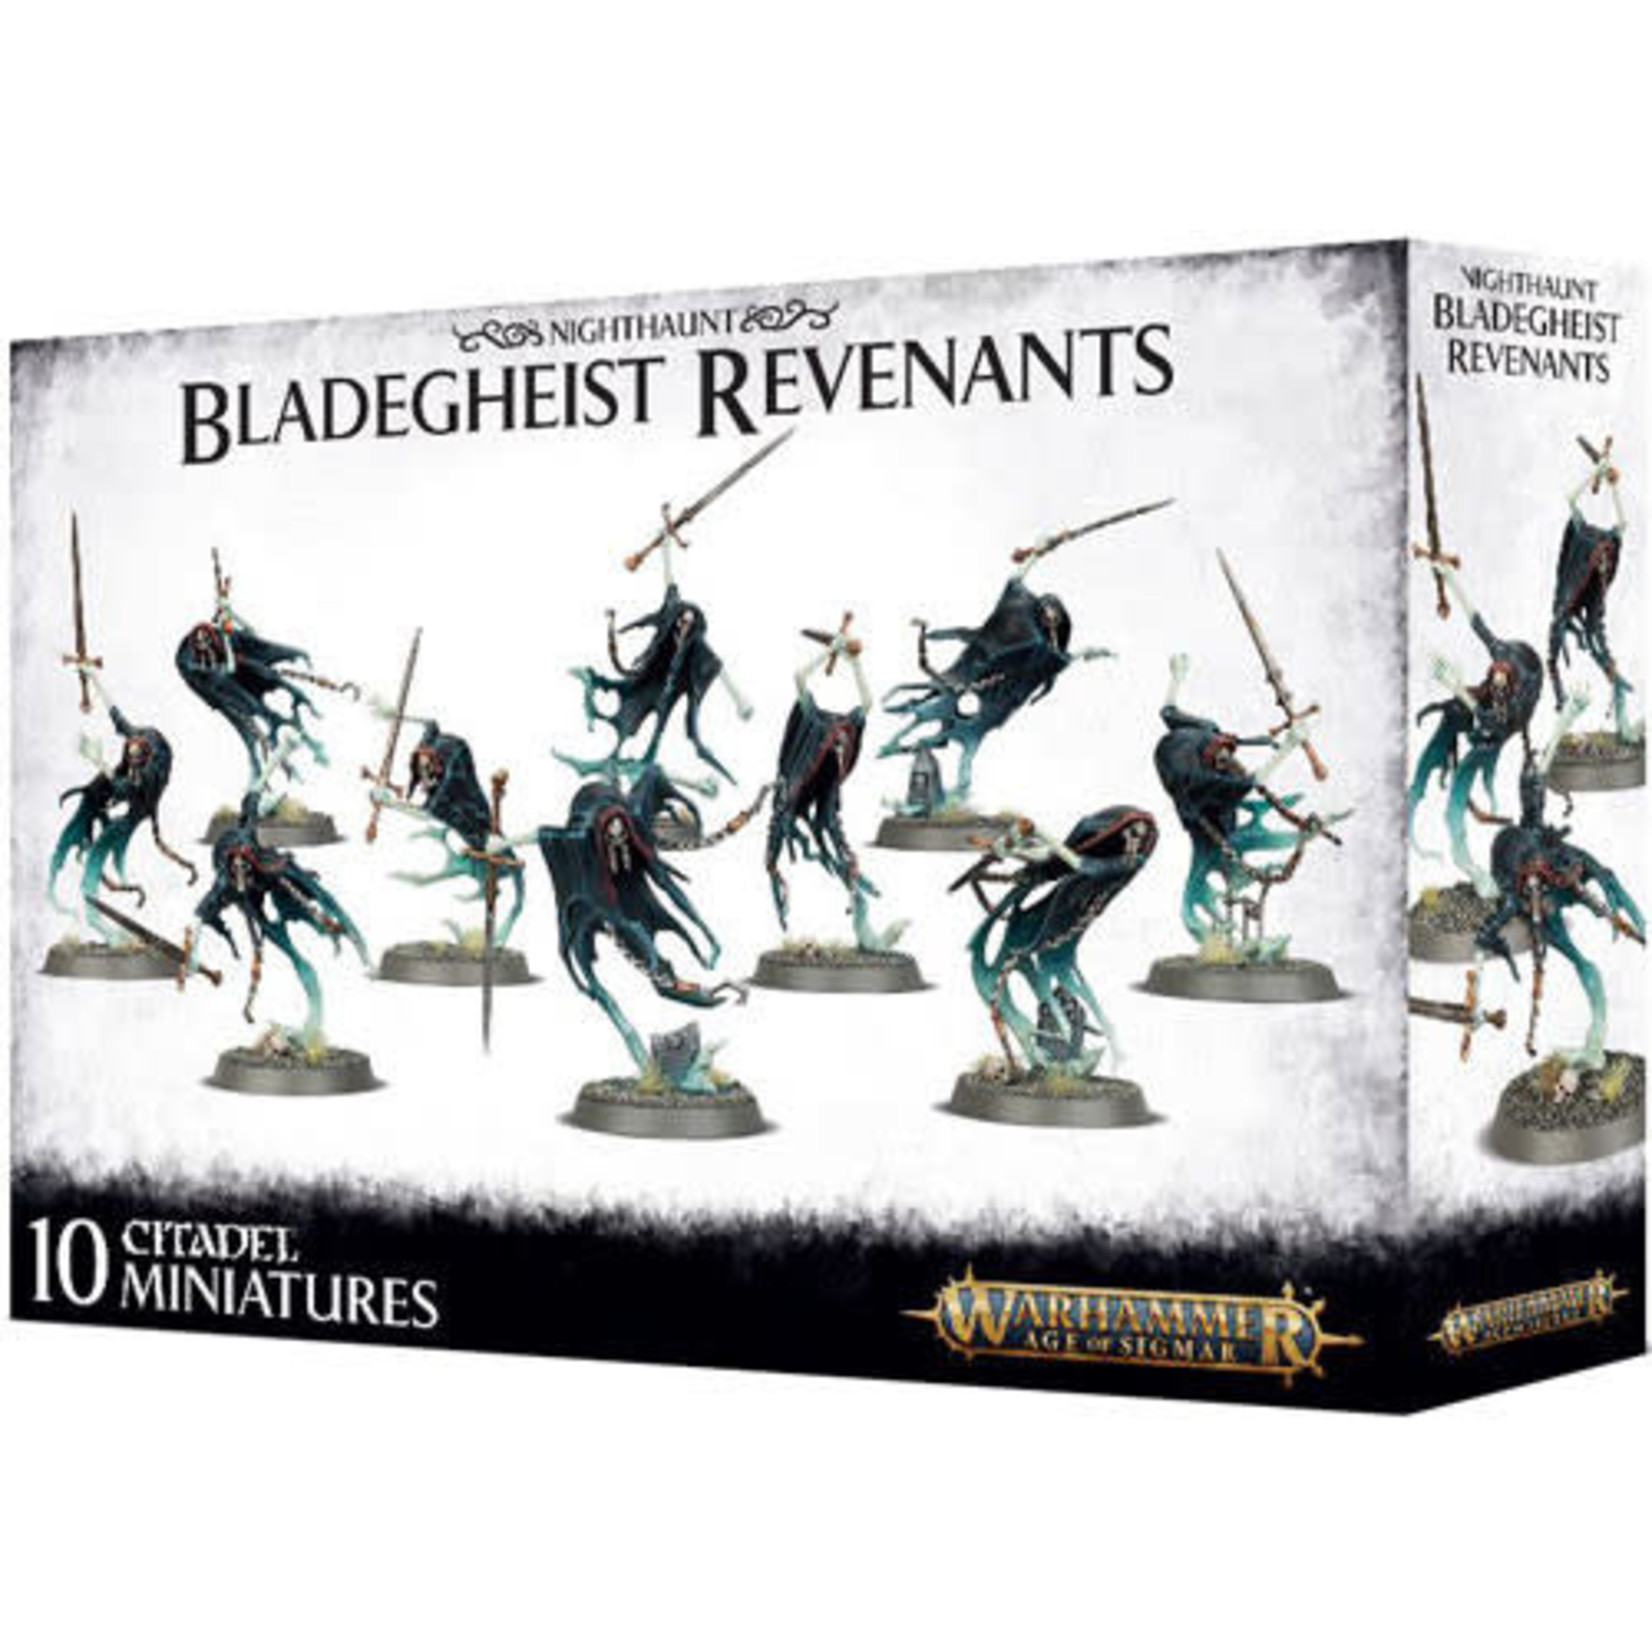 Nighthaunt Bladegeist Revenants (AOS)